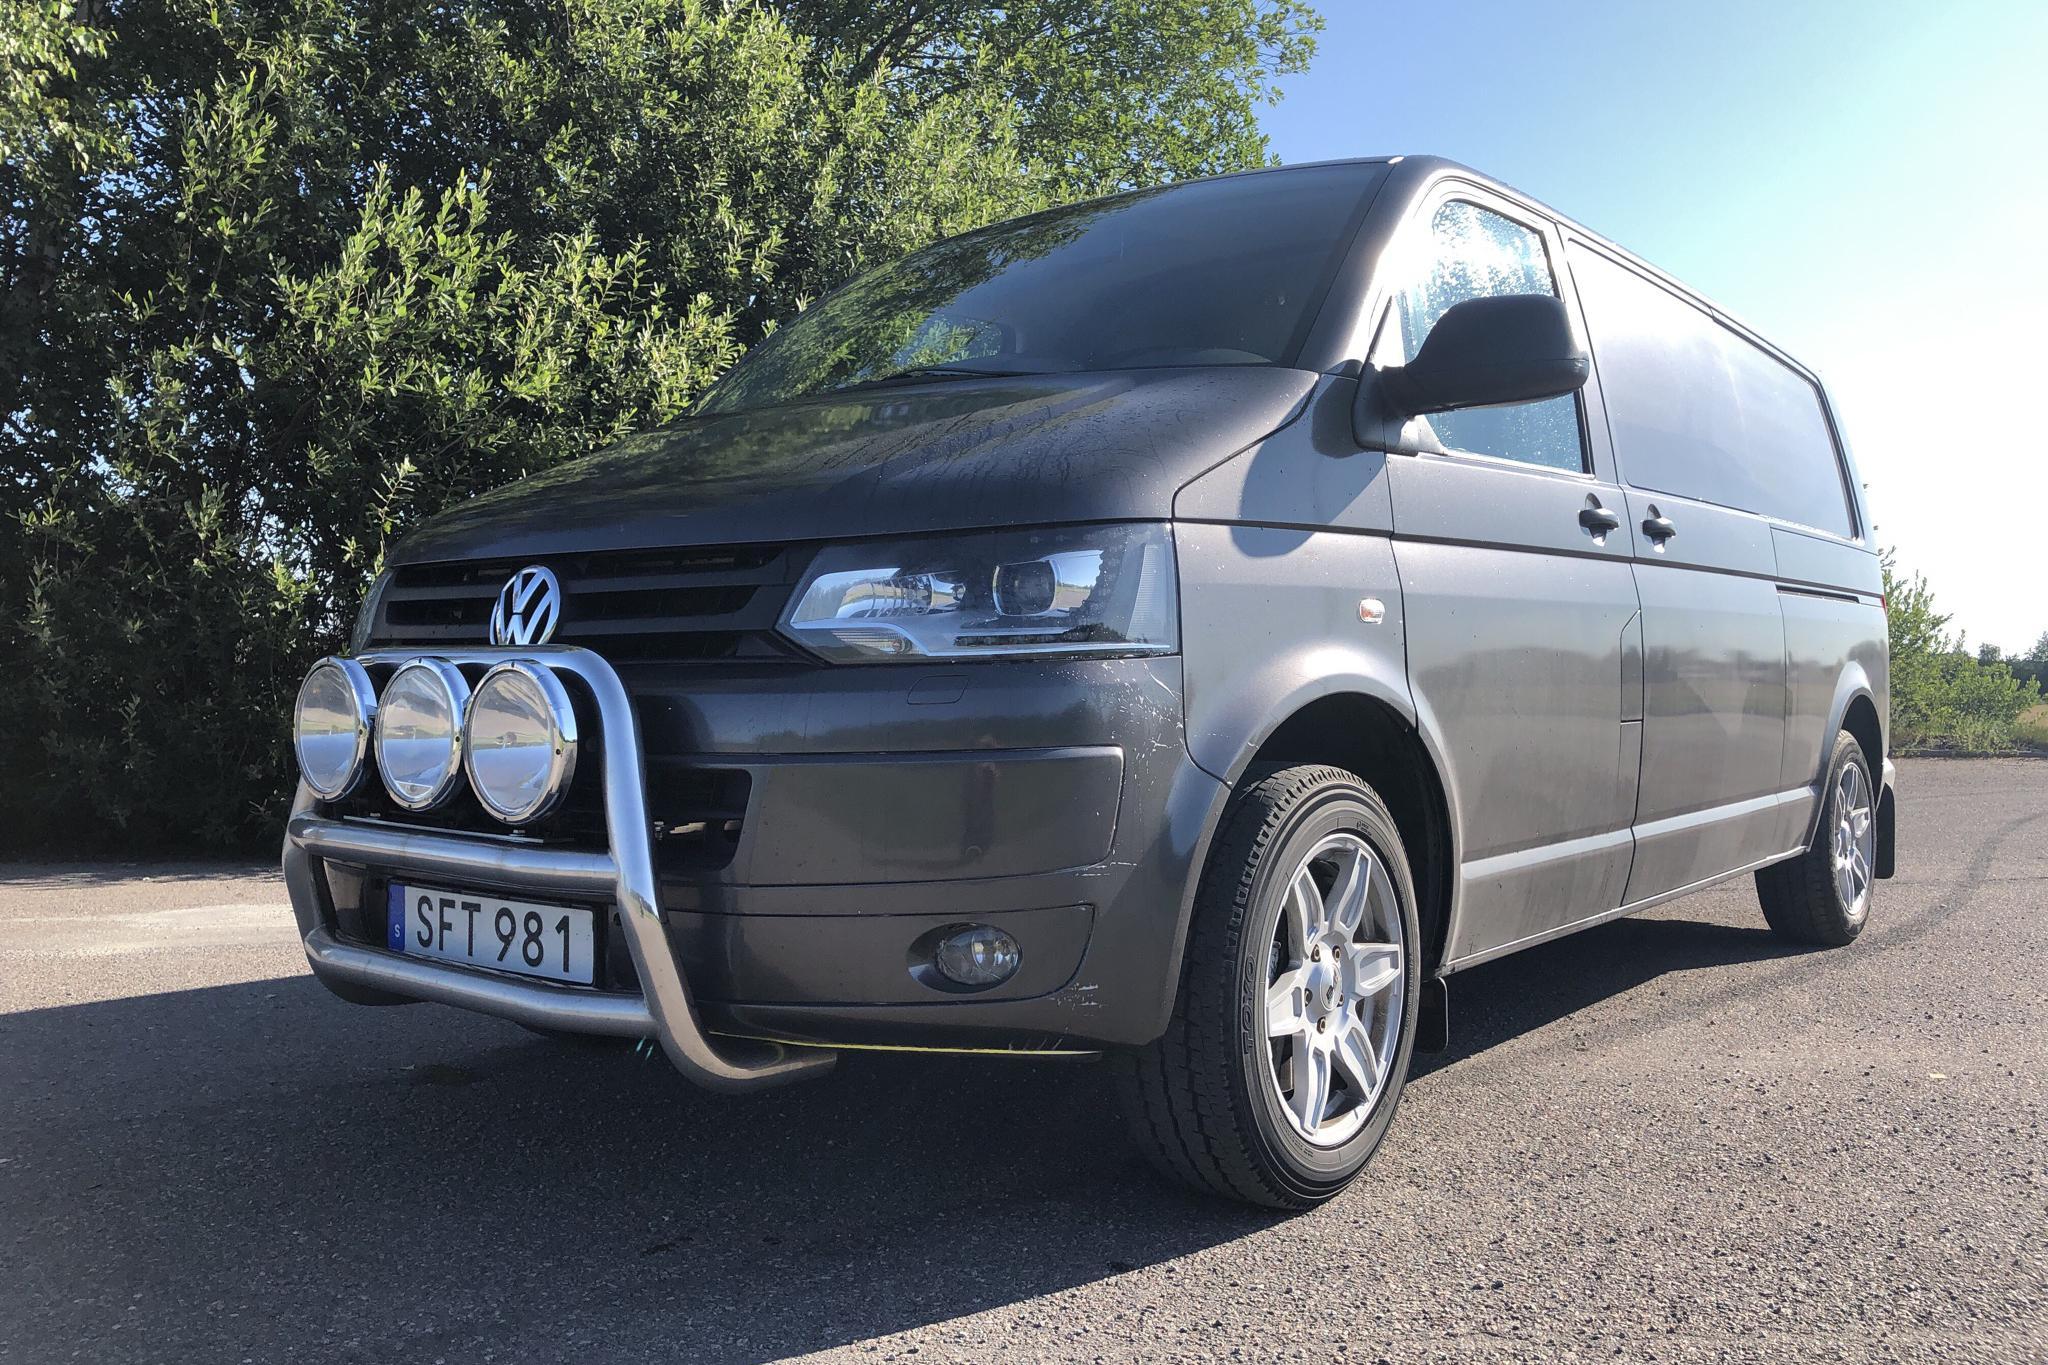 VW Transporter T5 2.0 TDI 4MOTION (180hk) - 29 150 mil - Automat - grå - 2012